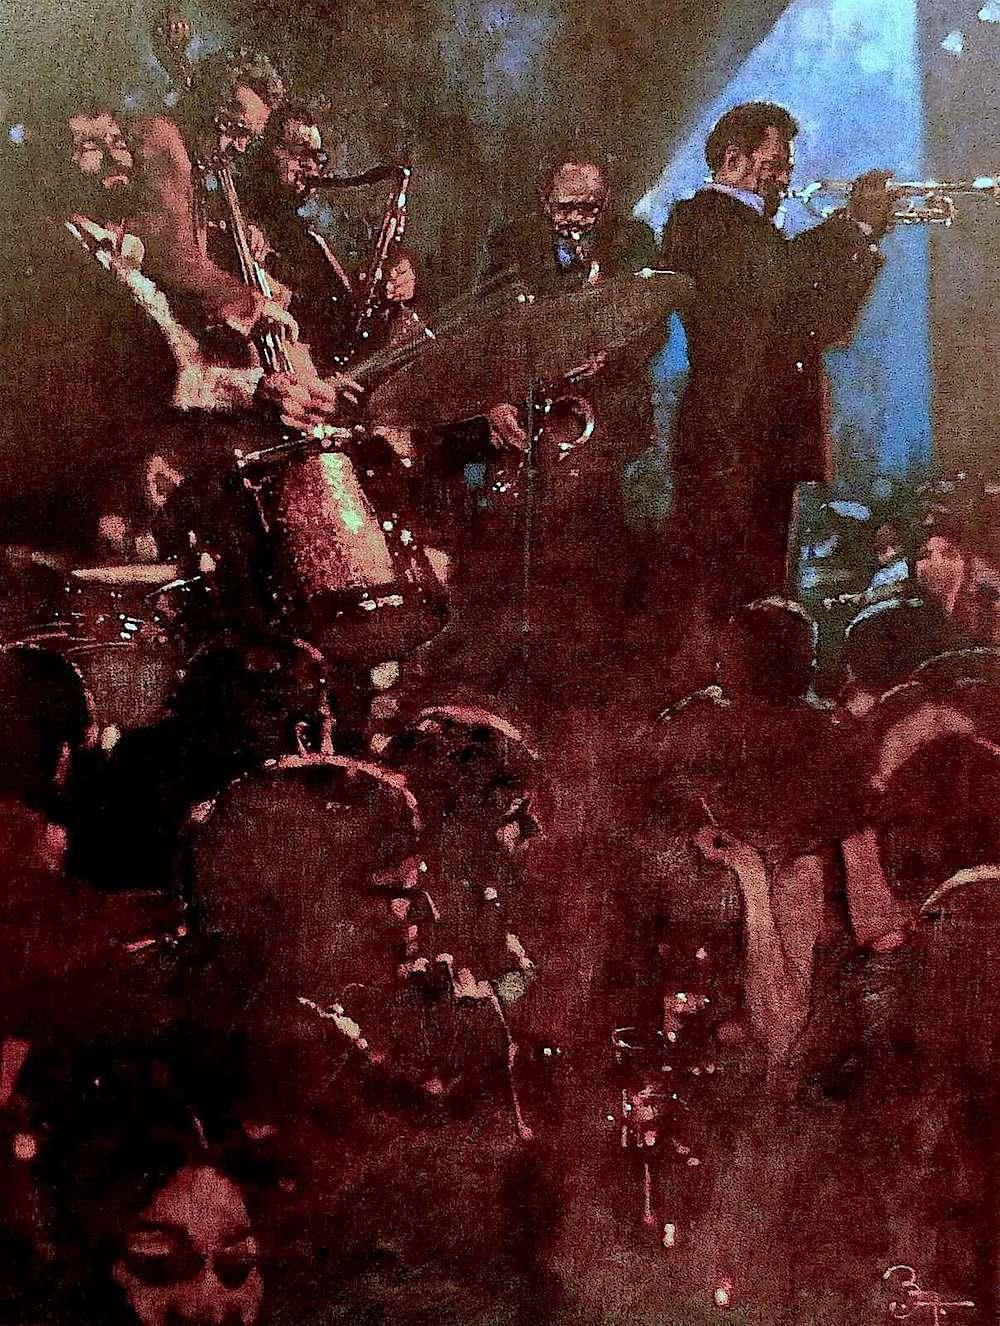 a Bernie Fuchs illustration of jazz musicians playing in a nightclub